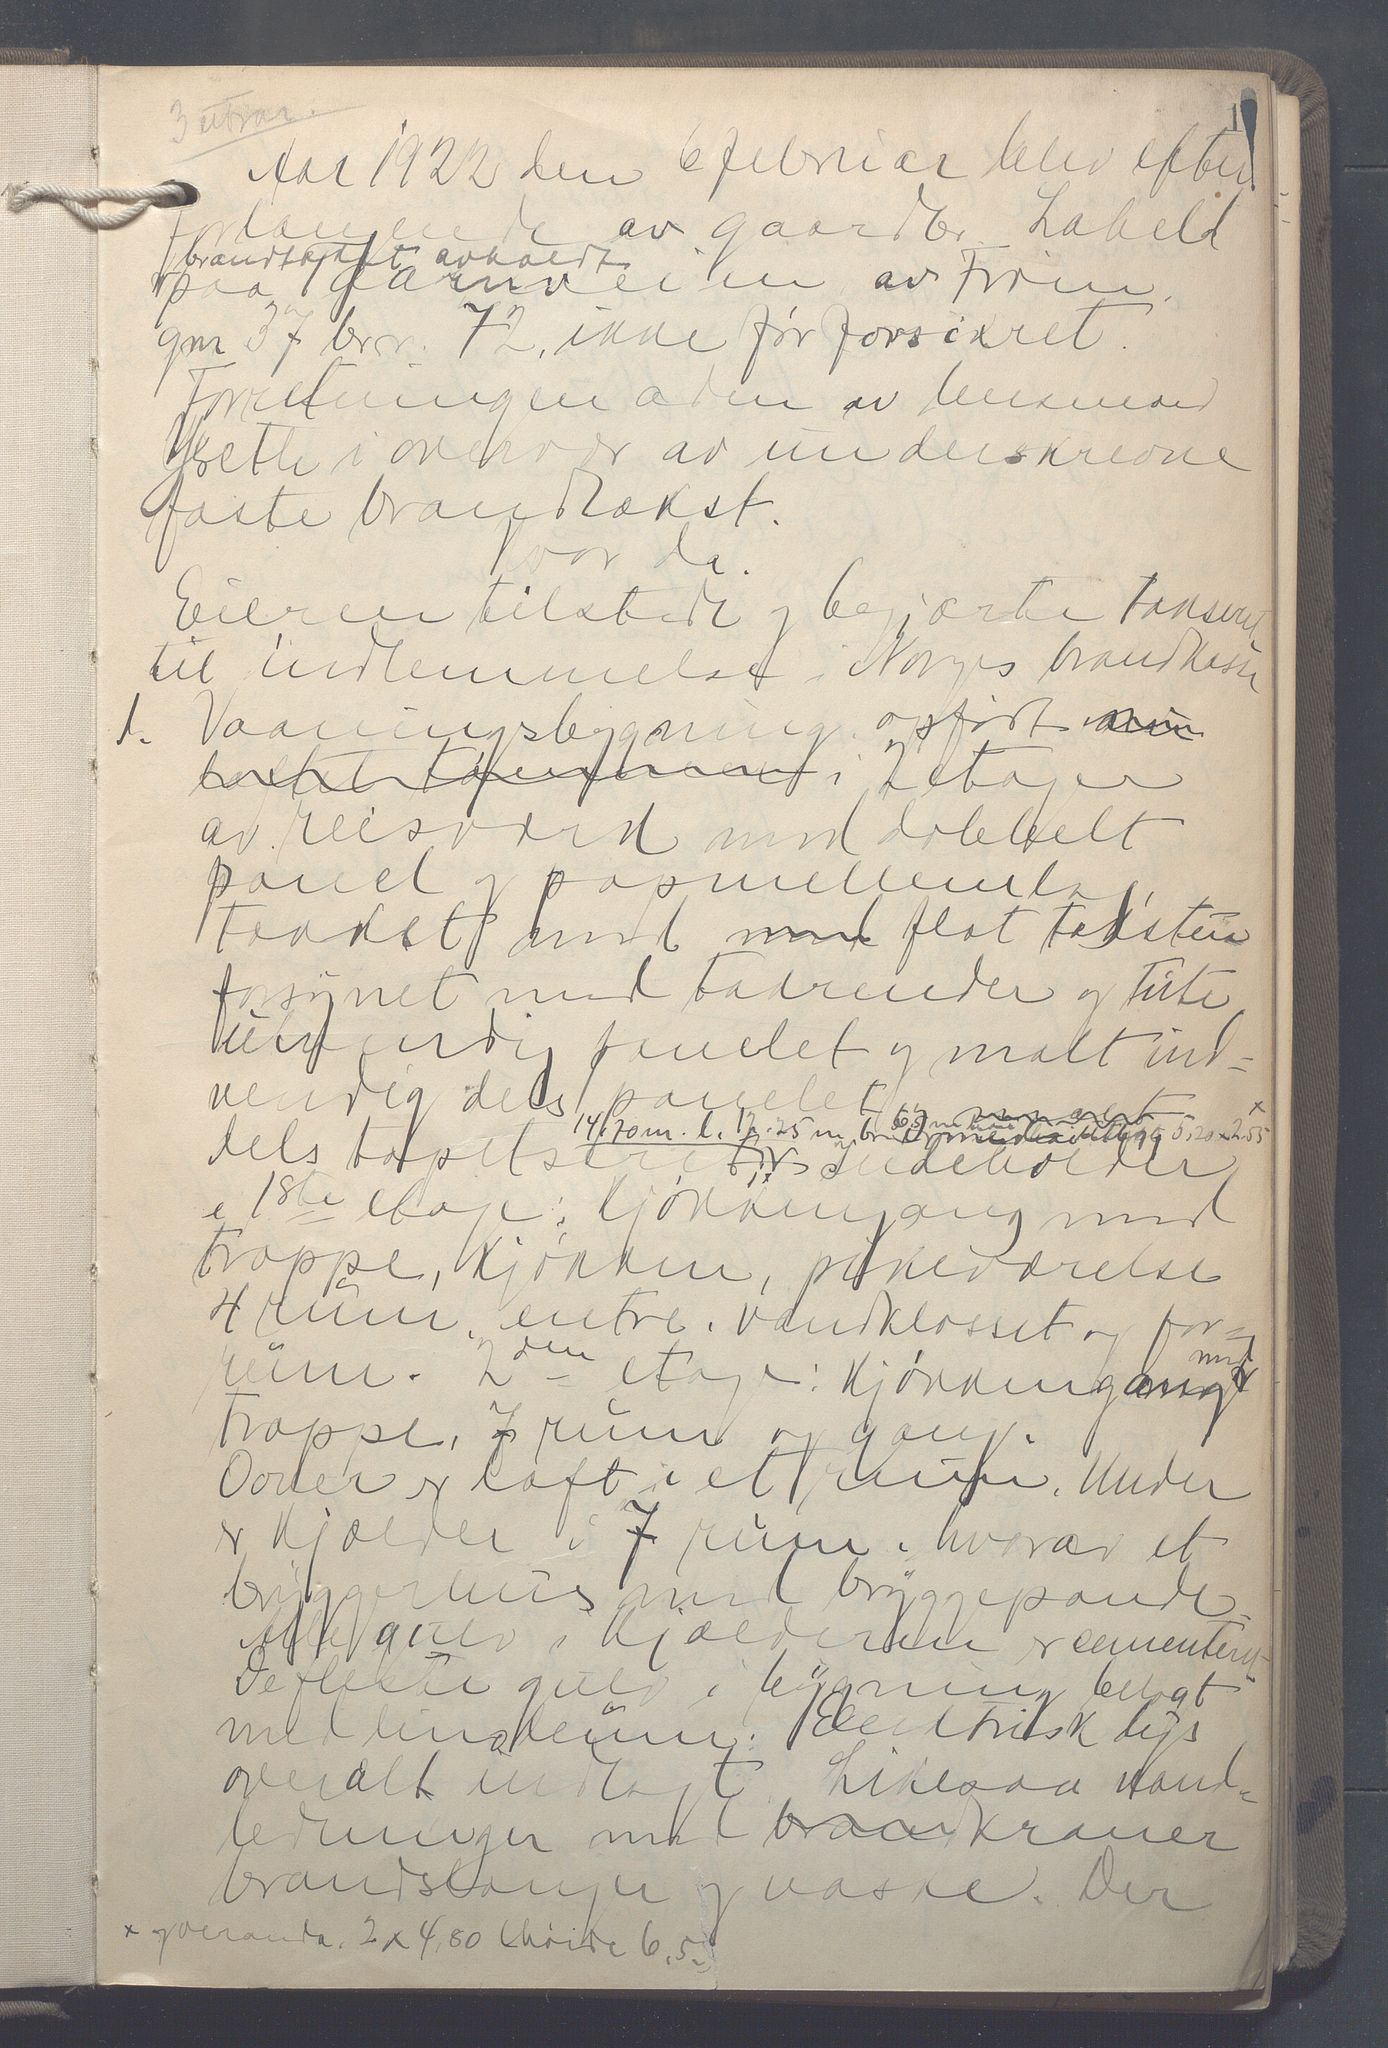 OBA, Lensmennene i Aker, F/Fa/L0021: Branntakstprotokoll, 1922-1925, p. 1